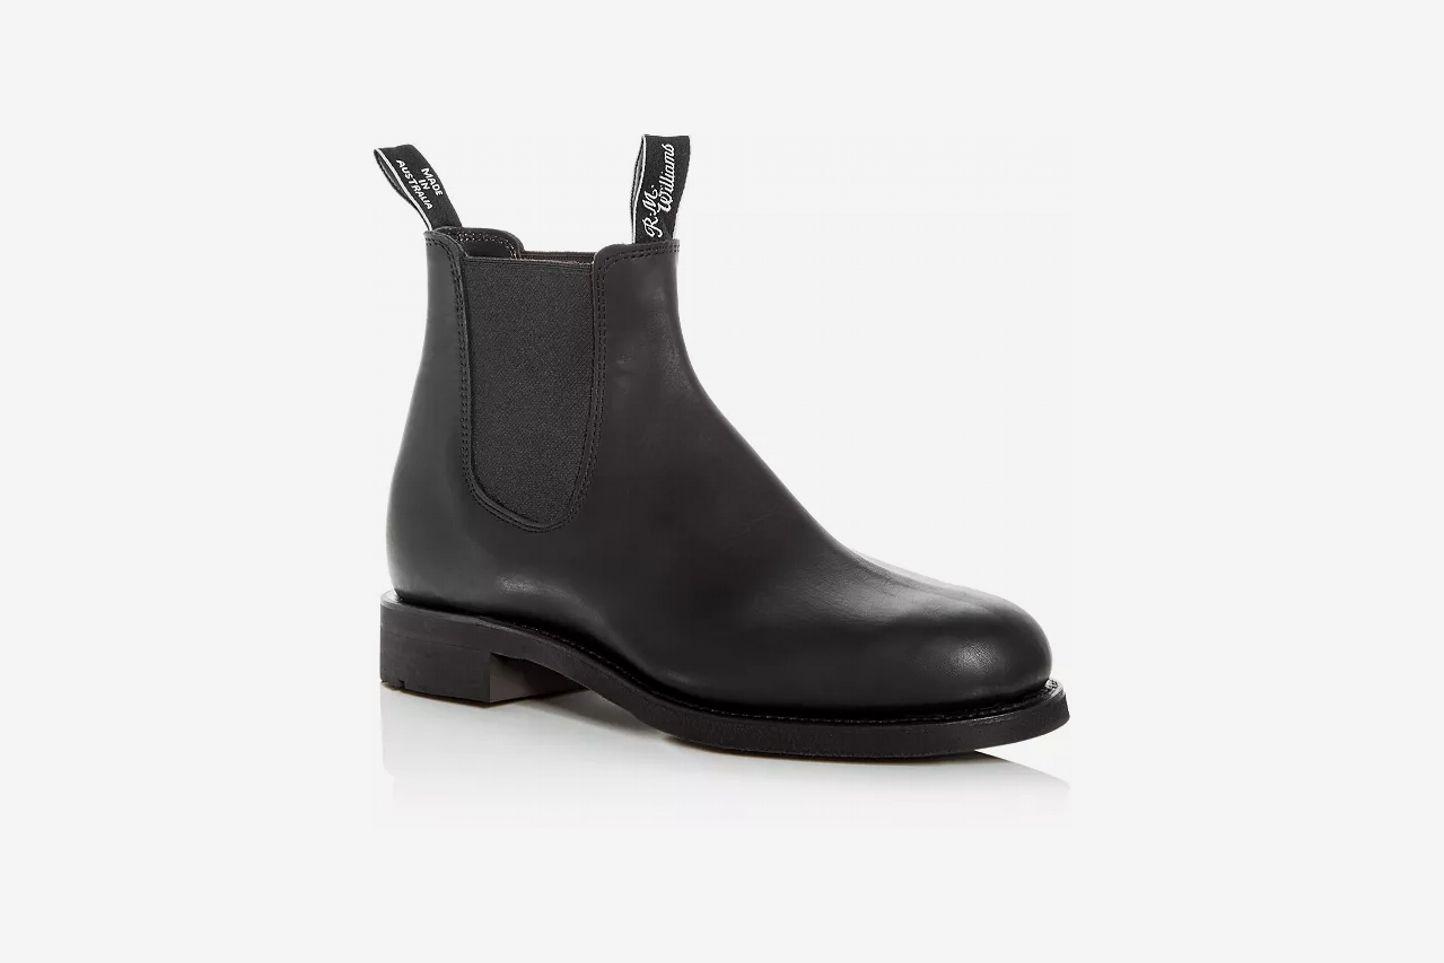 R.M. Williams Gardener Leather Chelsea Boots